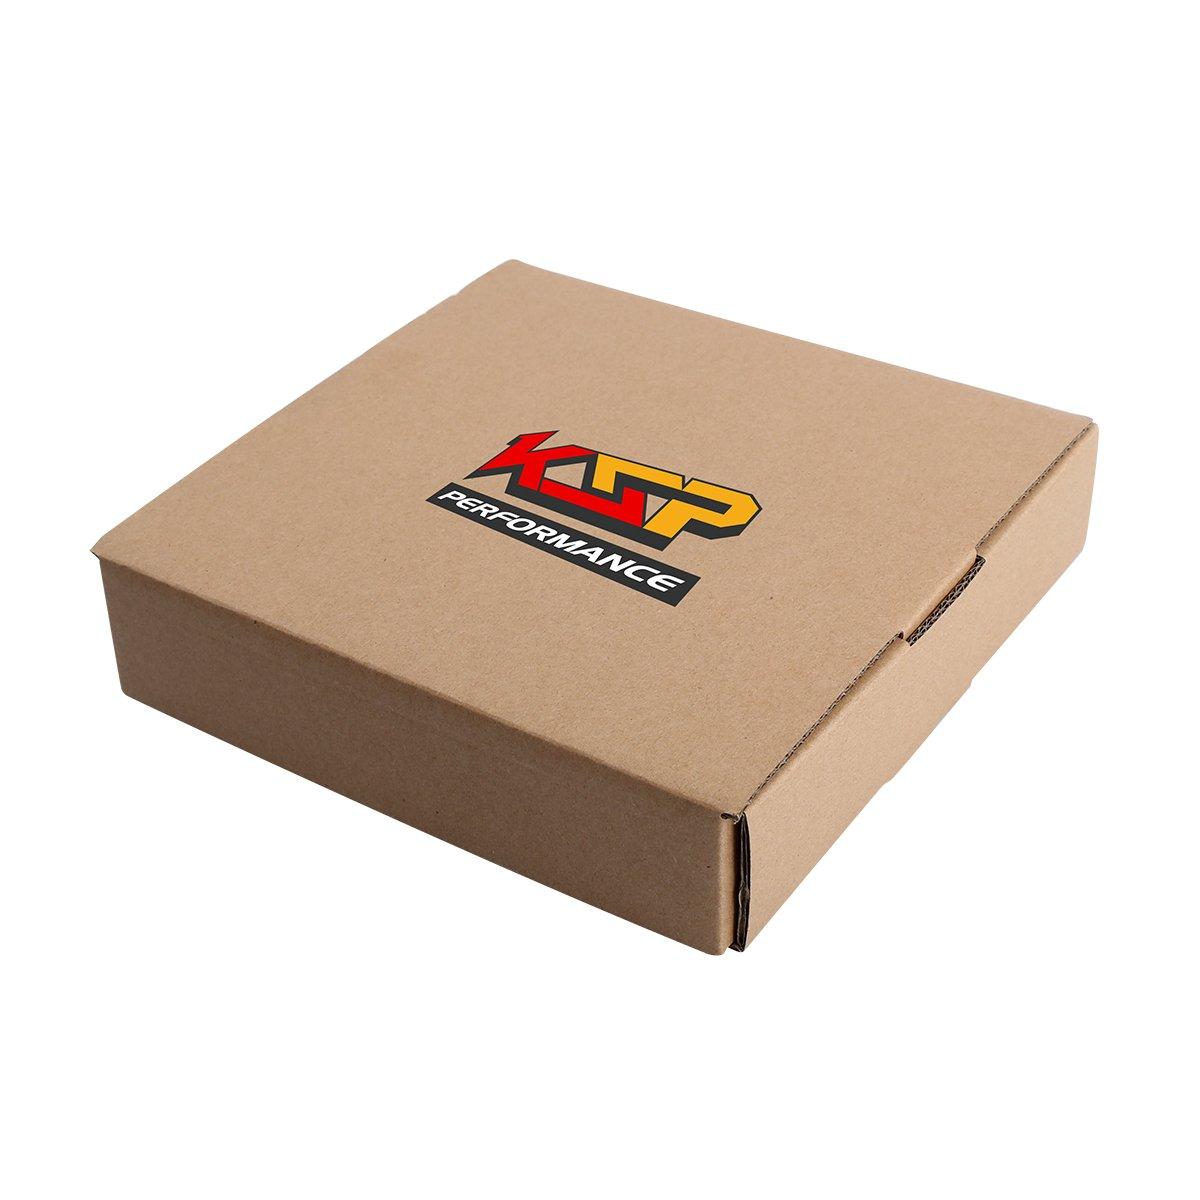 Black Acorn//Conical 6 Spline Duplex 1//2x20 Lug Nut Closed End Bulge Cone Seat 1.38 Tall with 2 keys Fit For 5 lugs Aftermarket Wheels 23 pcs KSP Wheel Lug Nuts 1//2-20